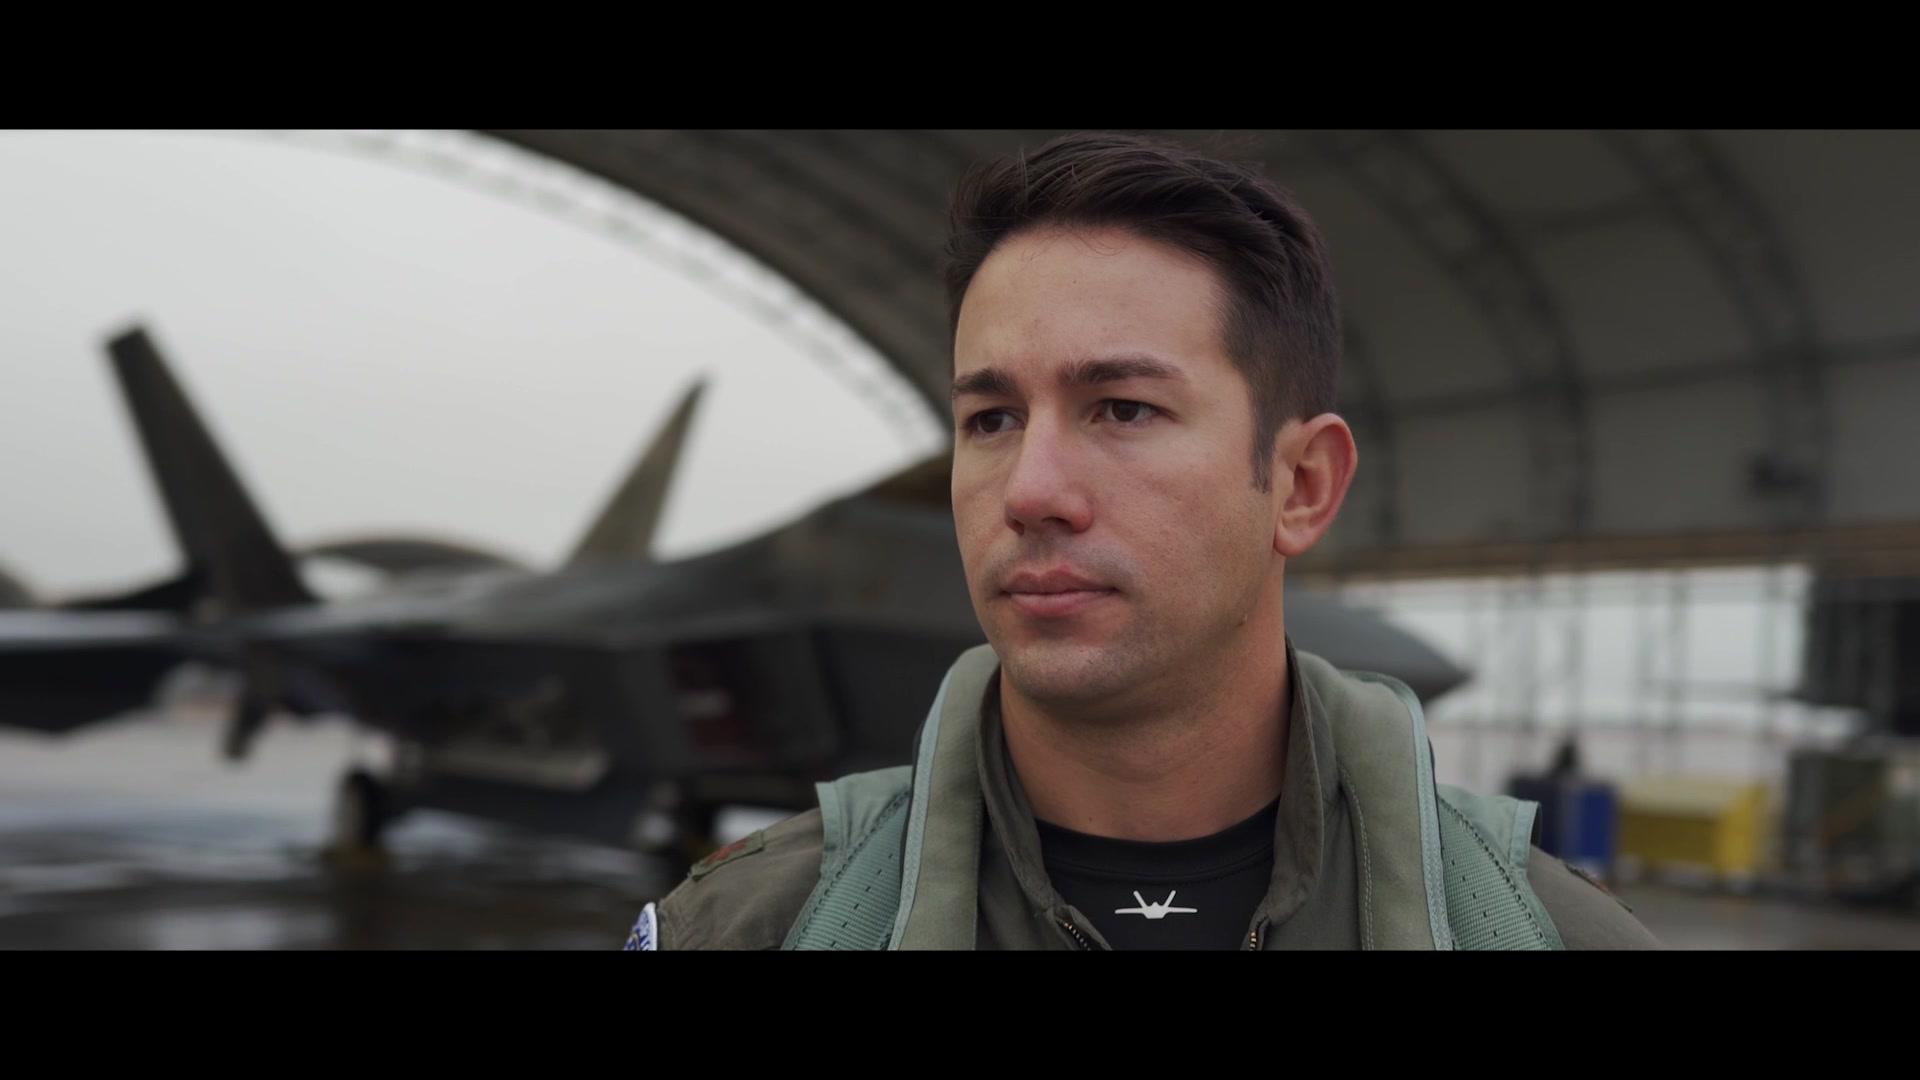 Video introducing Maj. Joshua 'Cabo' Gunderson, commander  of F-22 Raptor Demonstration Team.